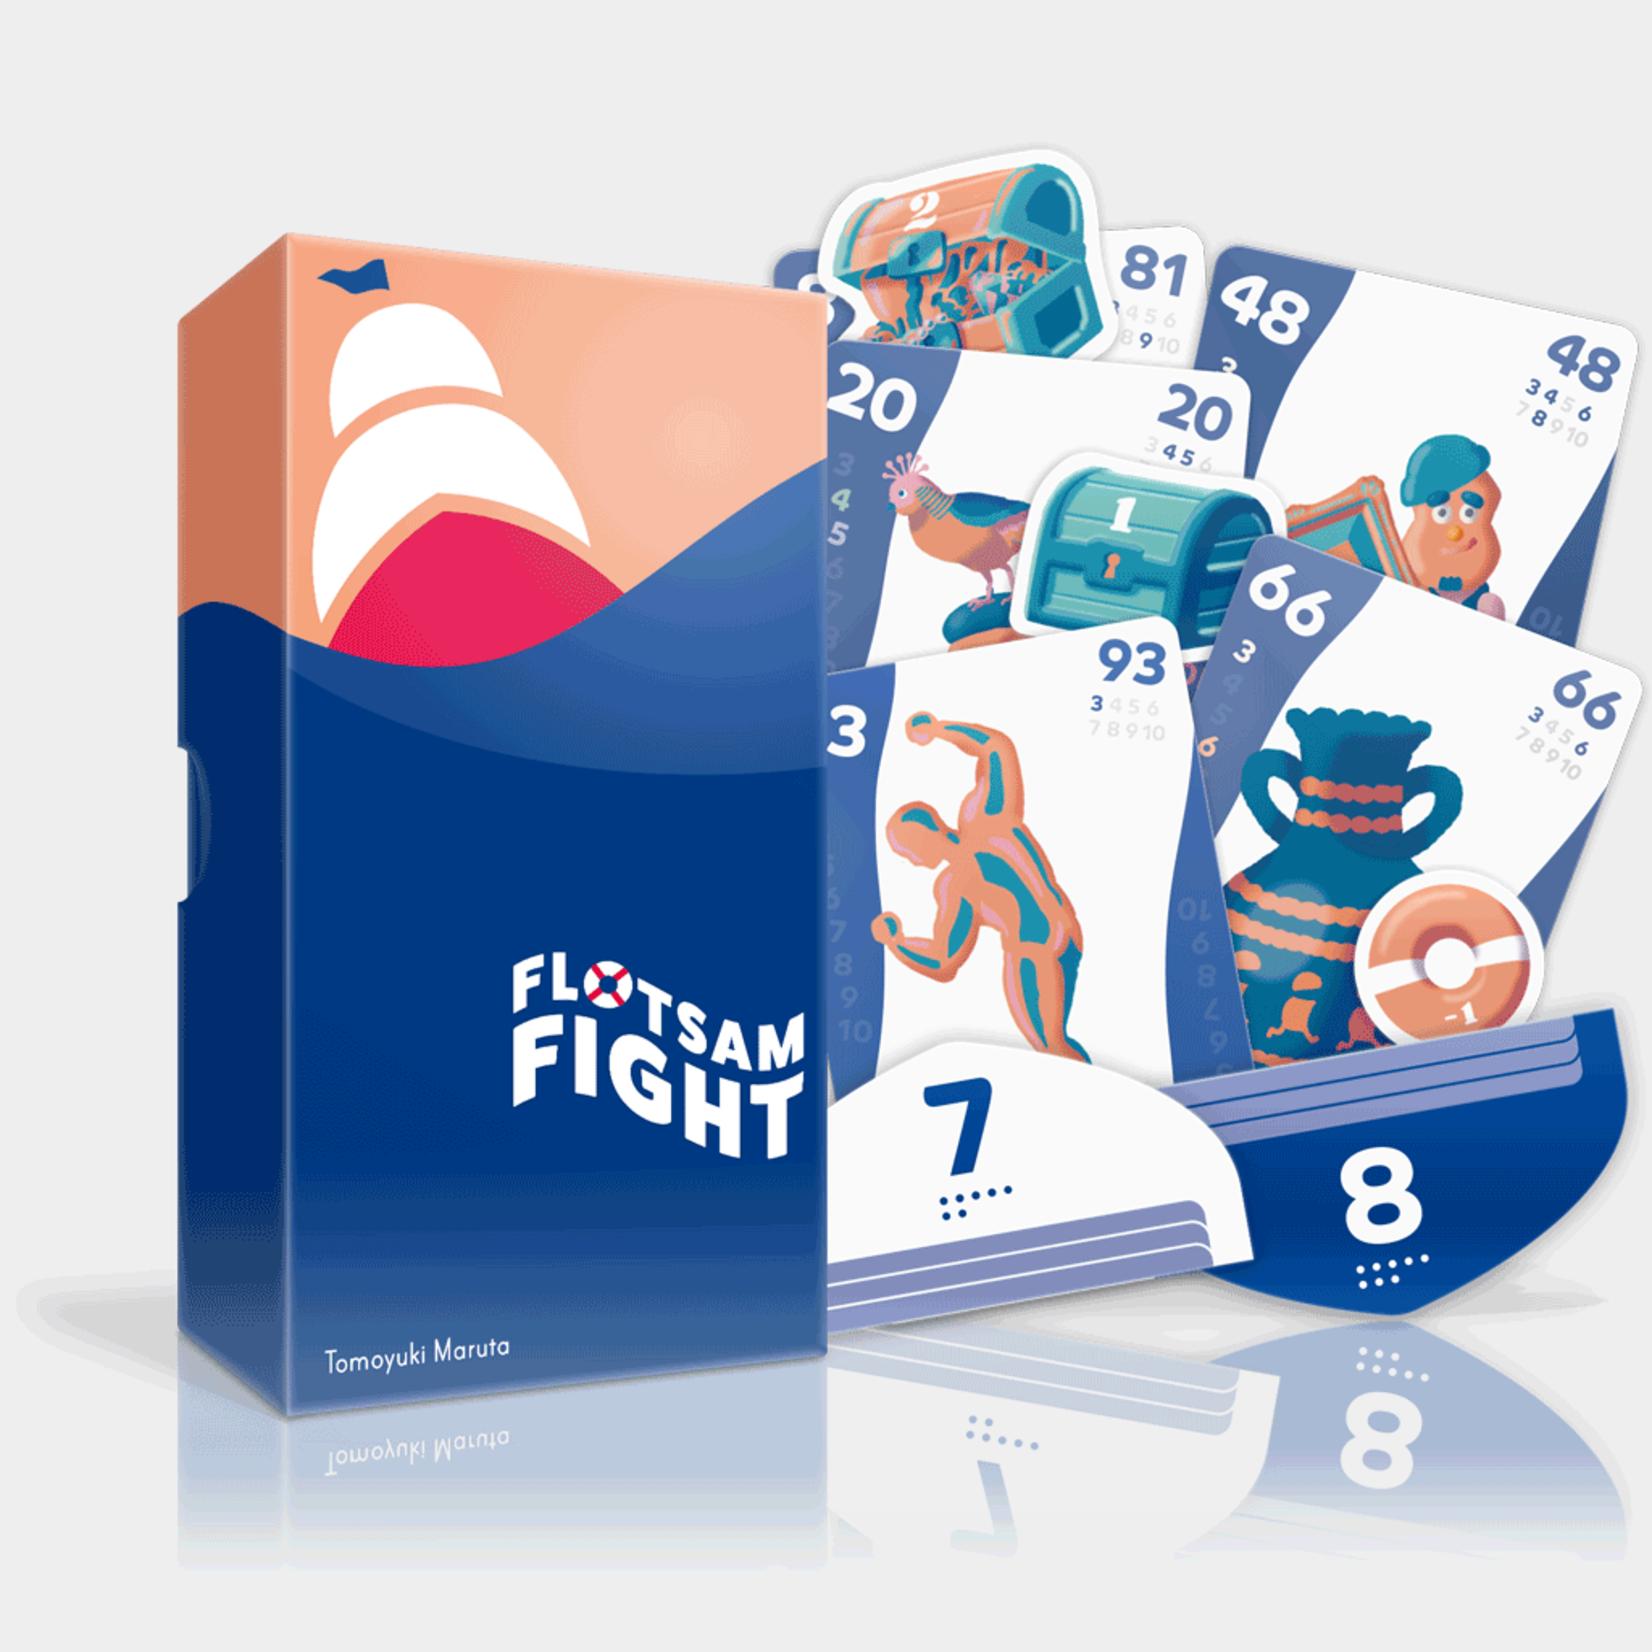 Oink Games Flotsam Fight